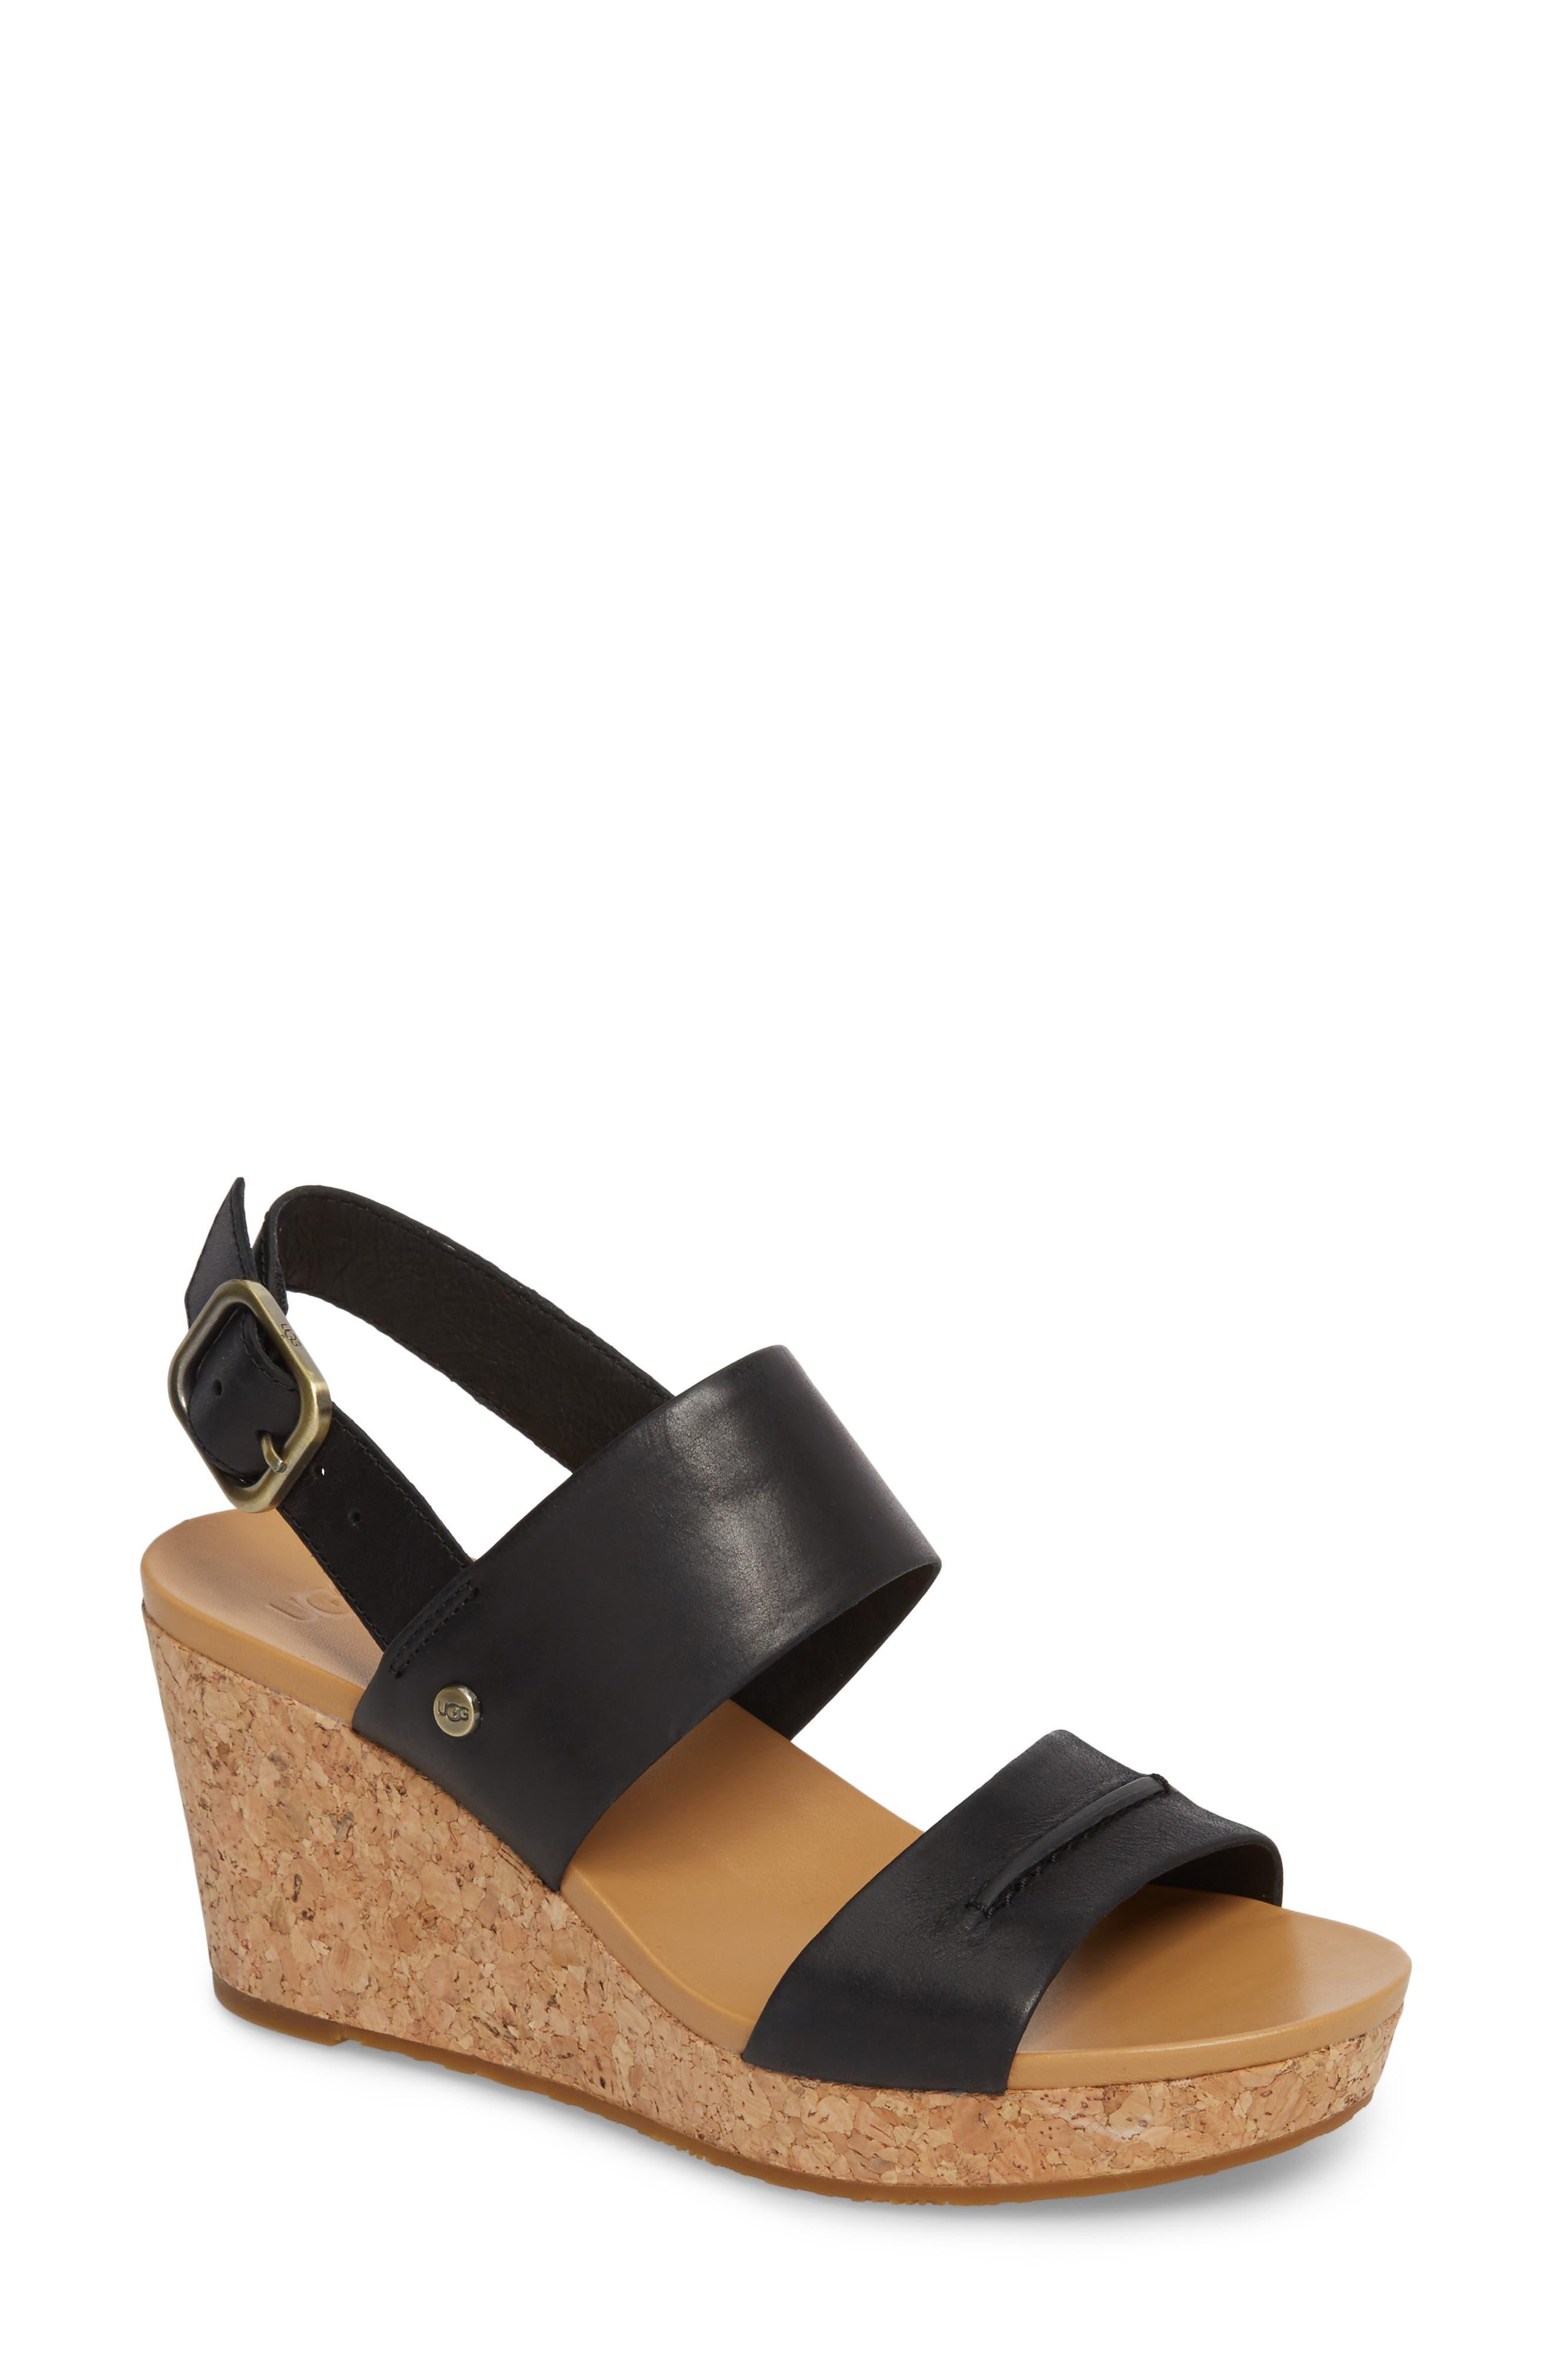 Elena II Platform Wedge Sandal,                         Main,                         color,